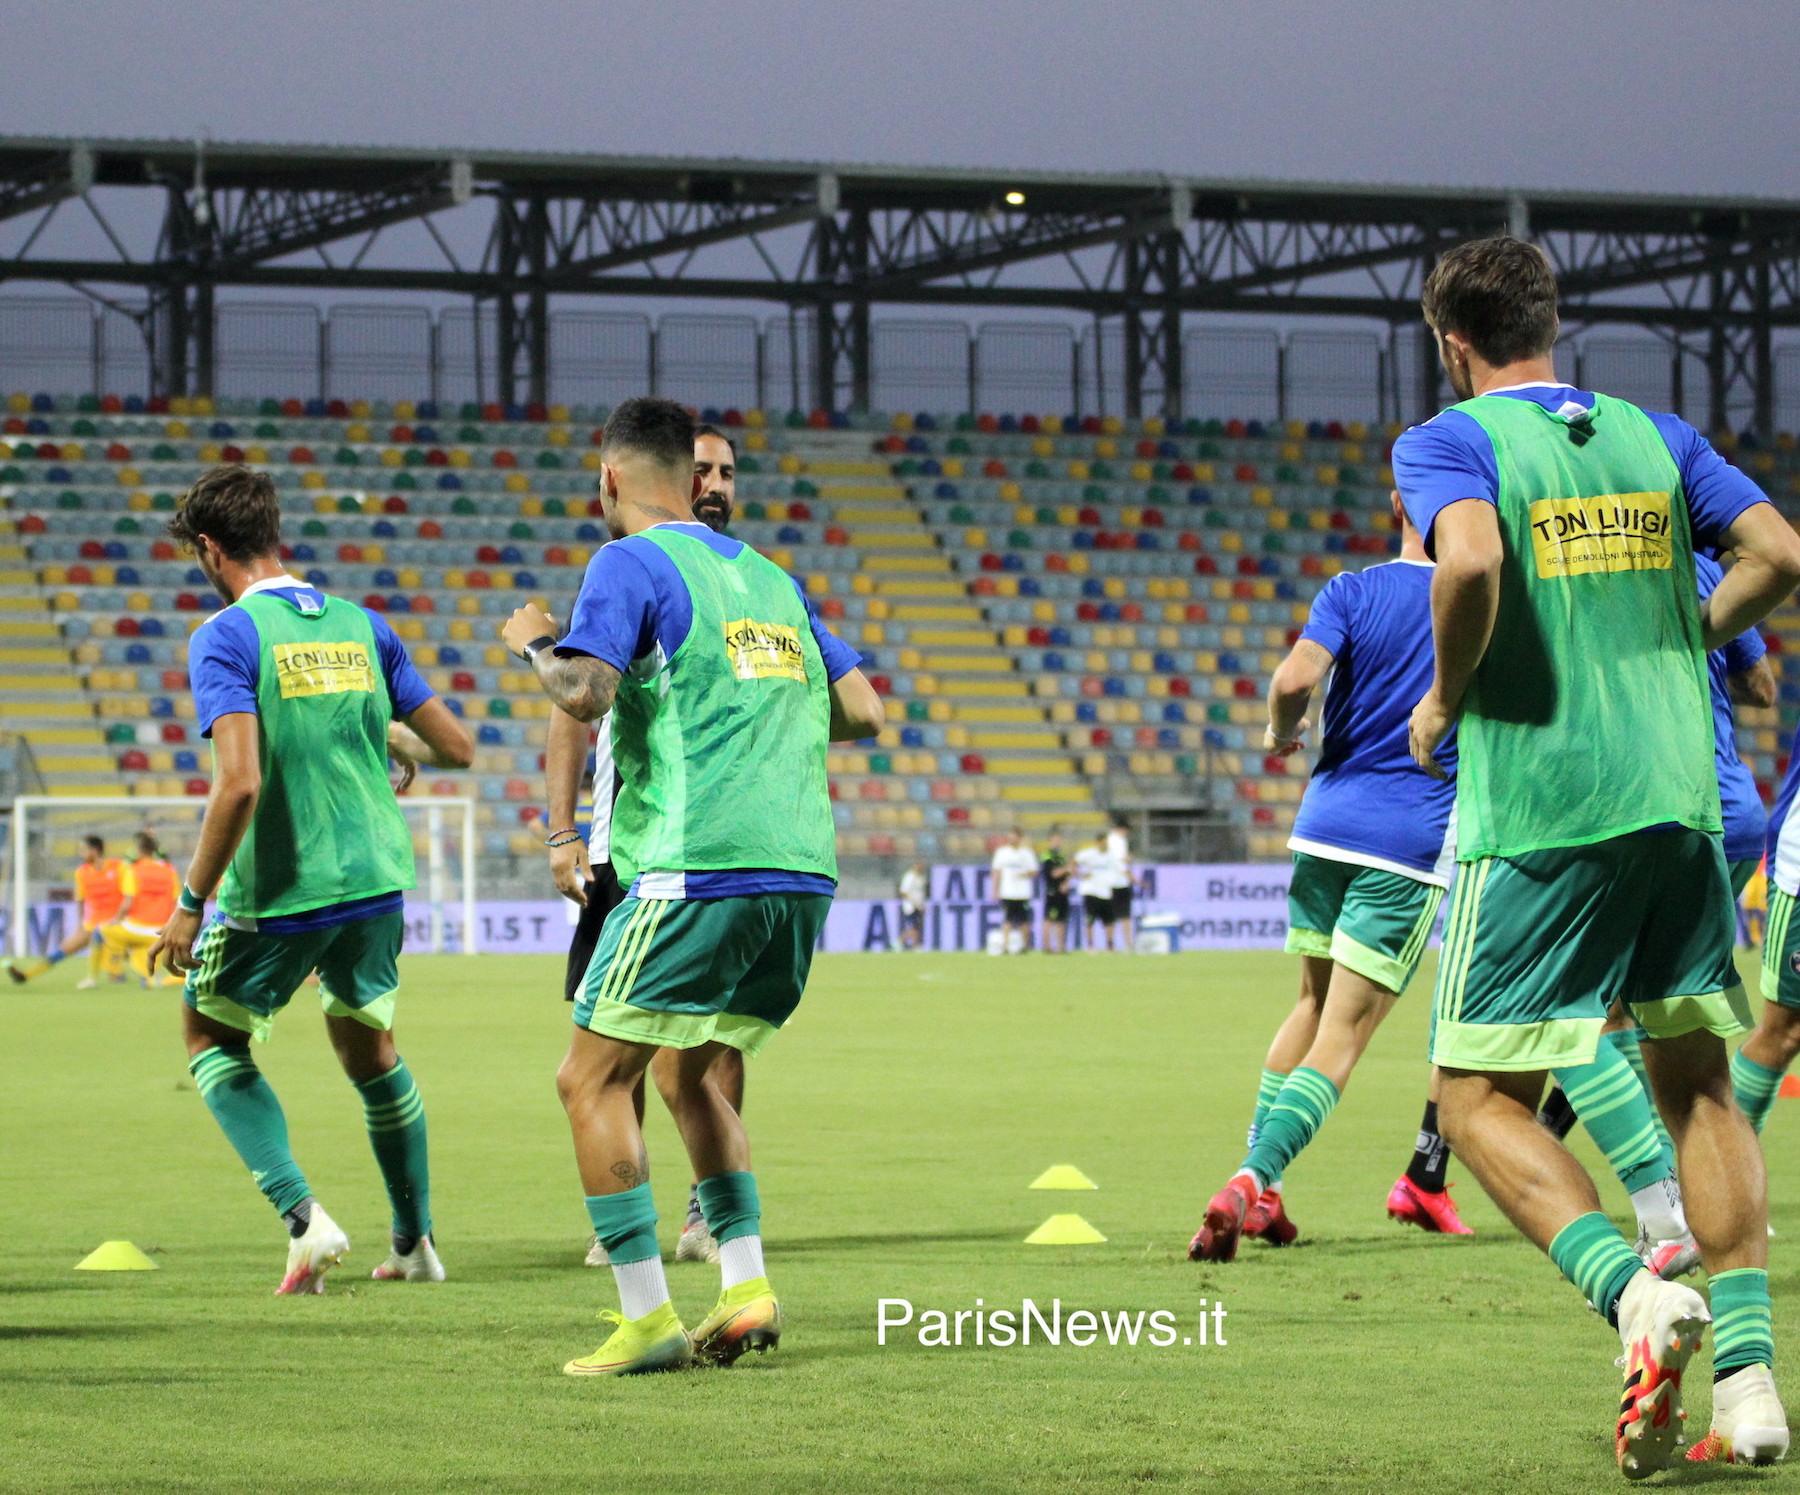 Frosinone - Pisa 1-1 fin